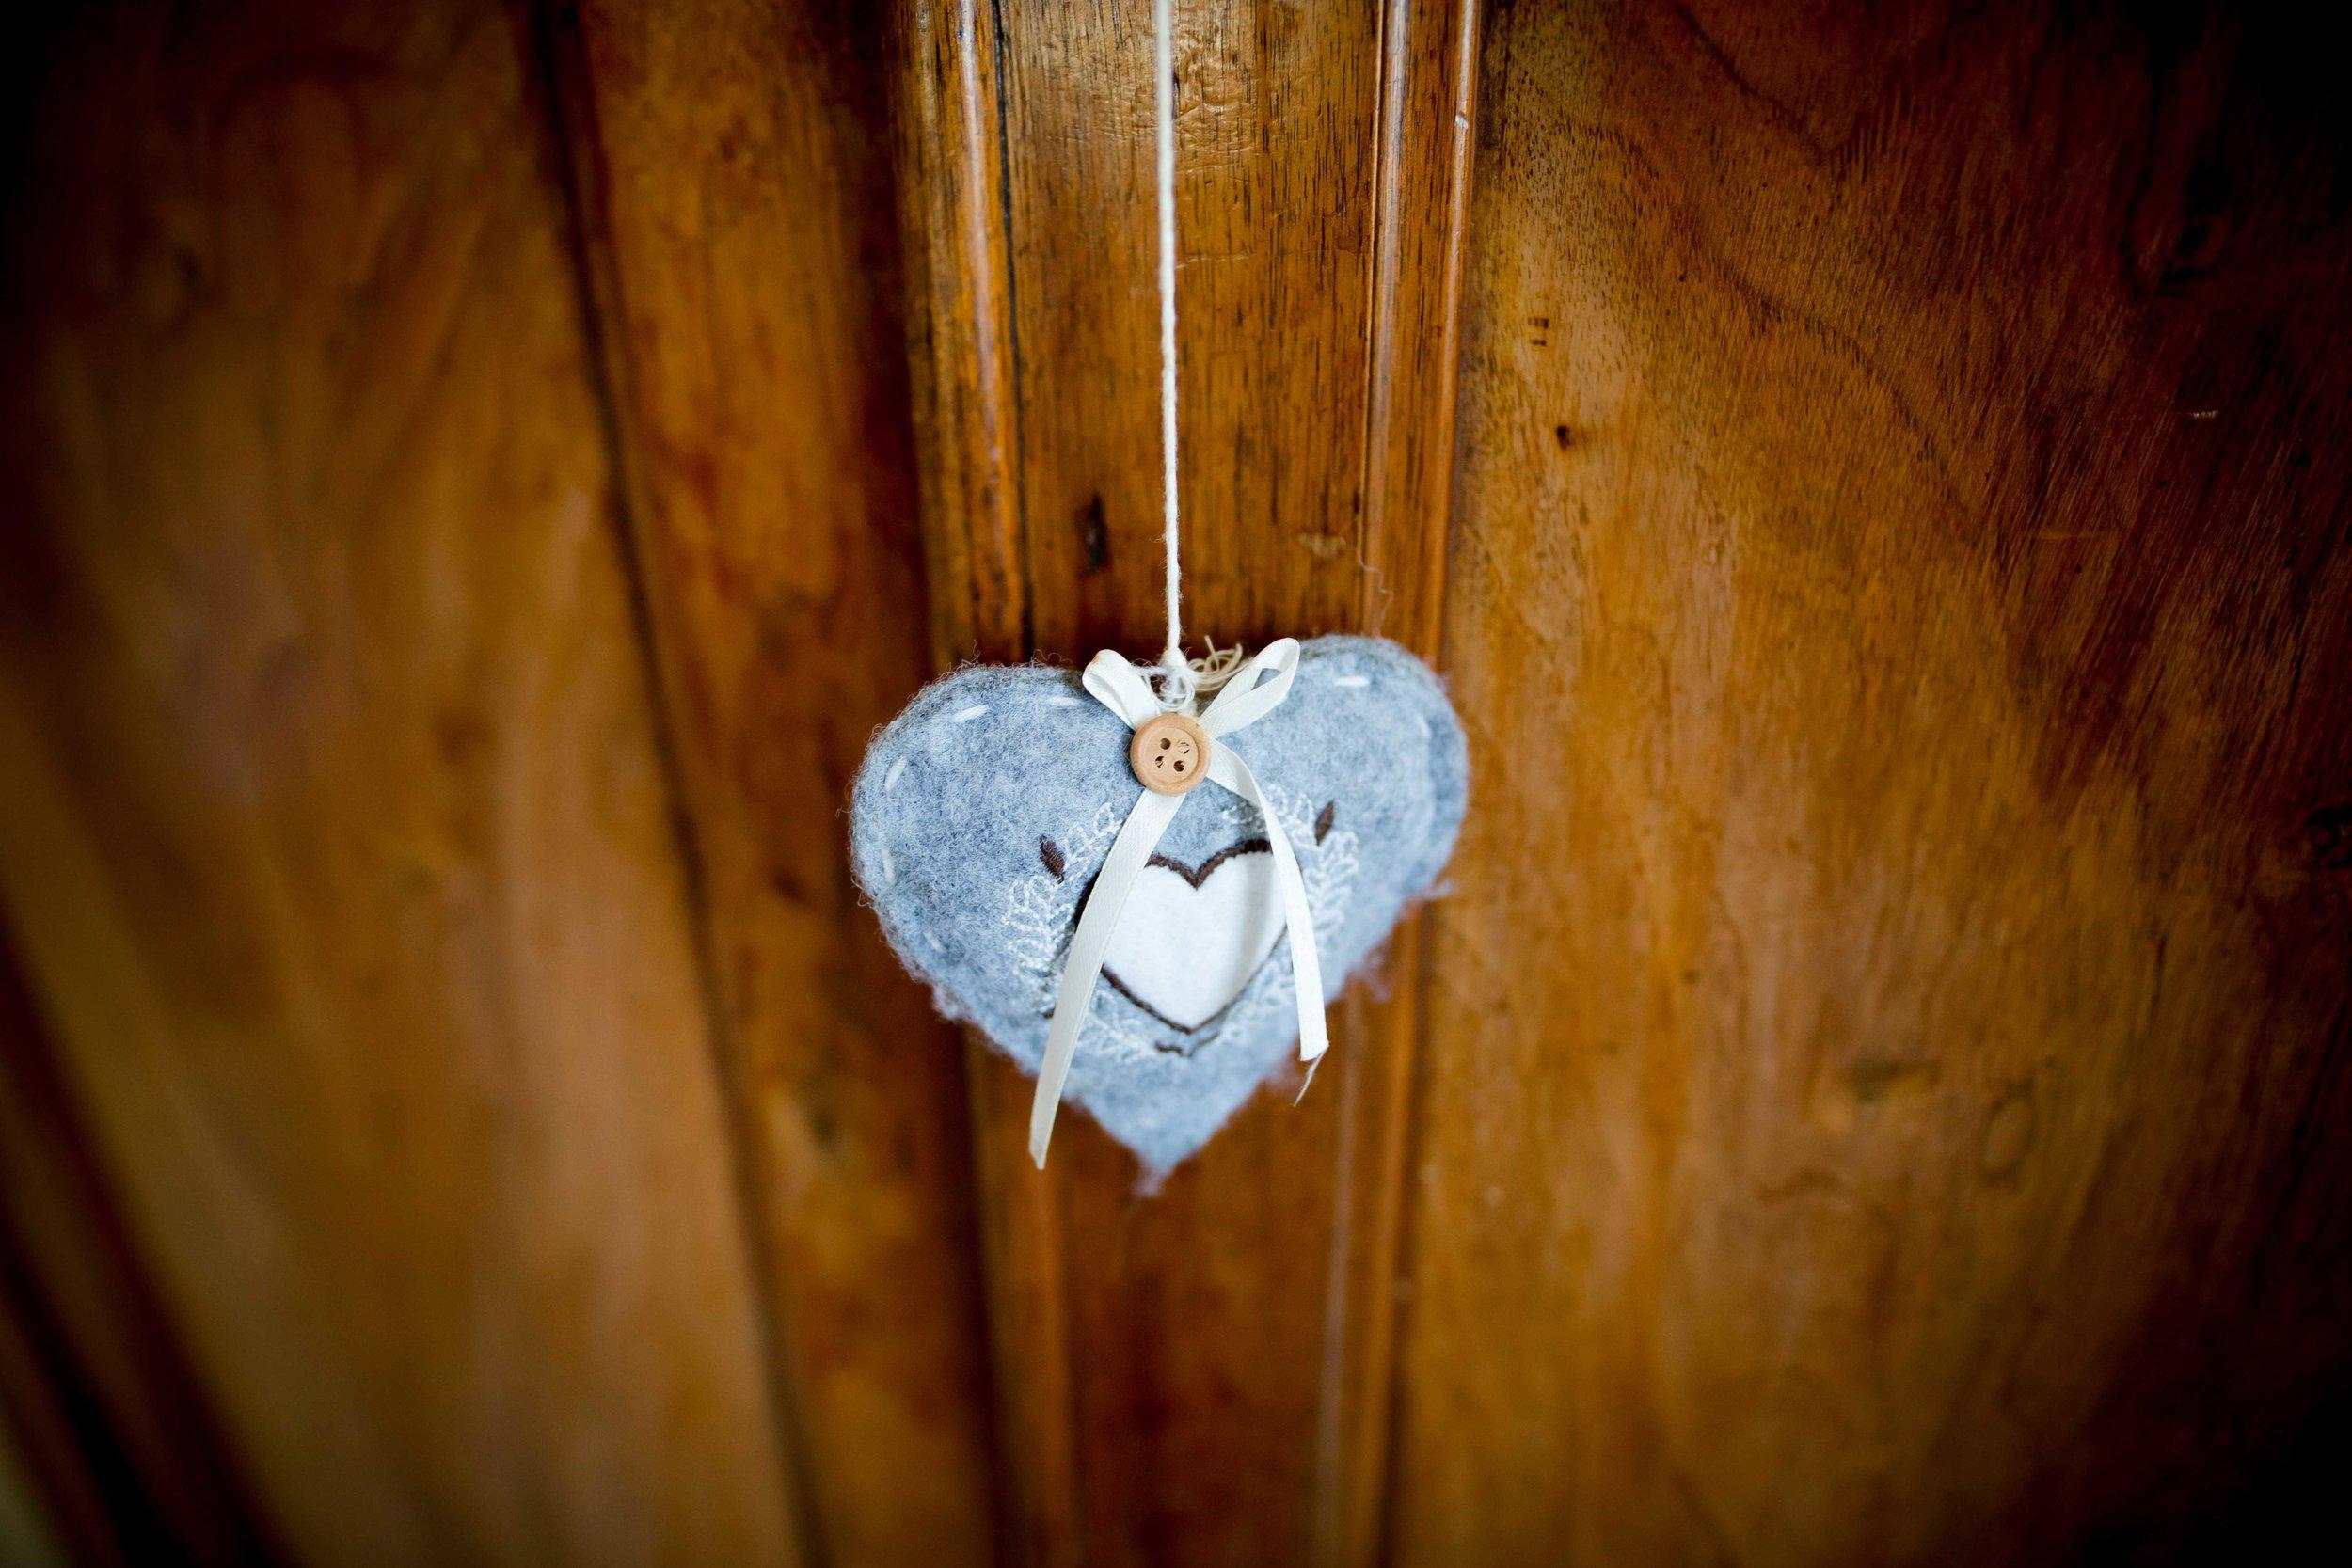 decoration-mariage-decoration-mariageIMG_5313.jpg